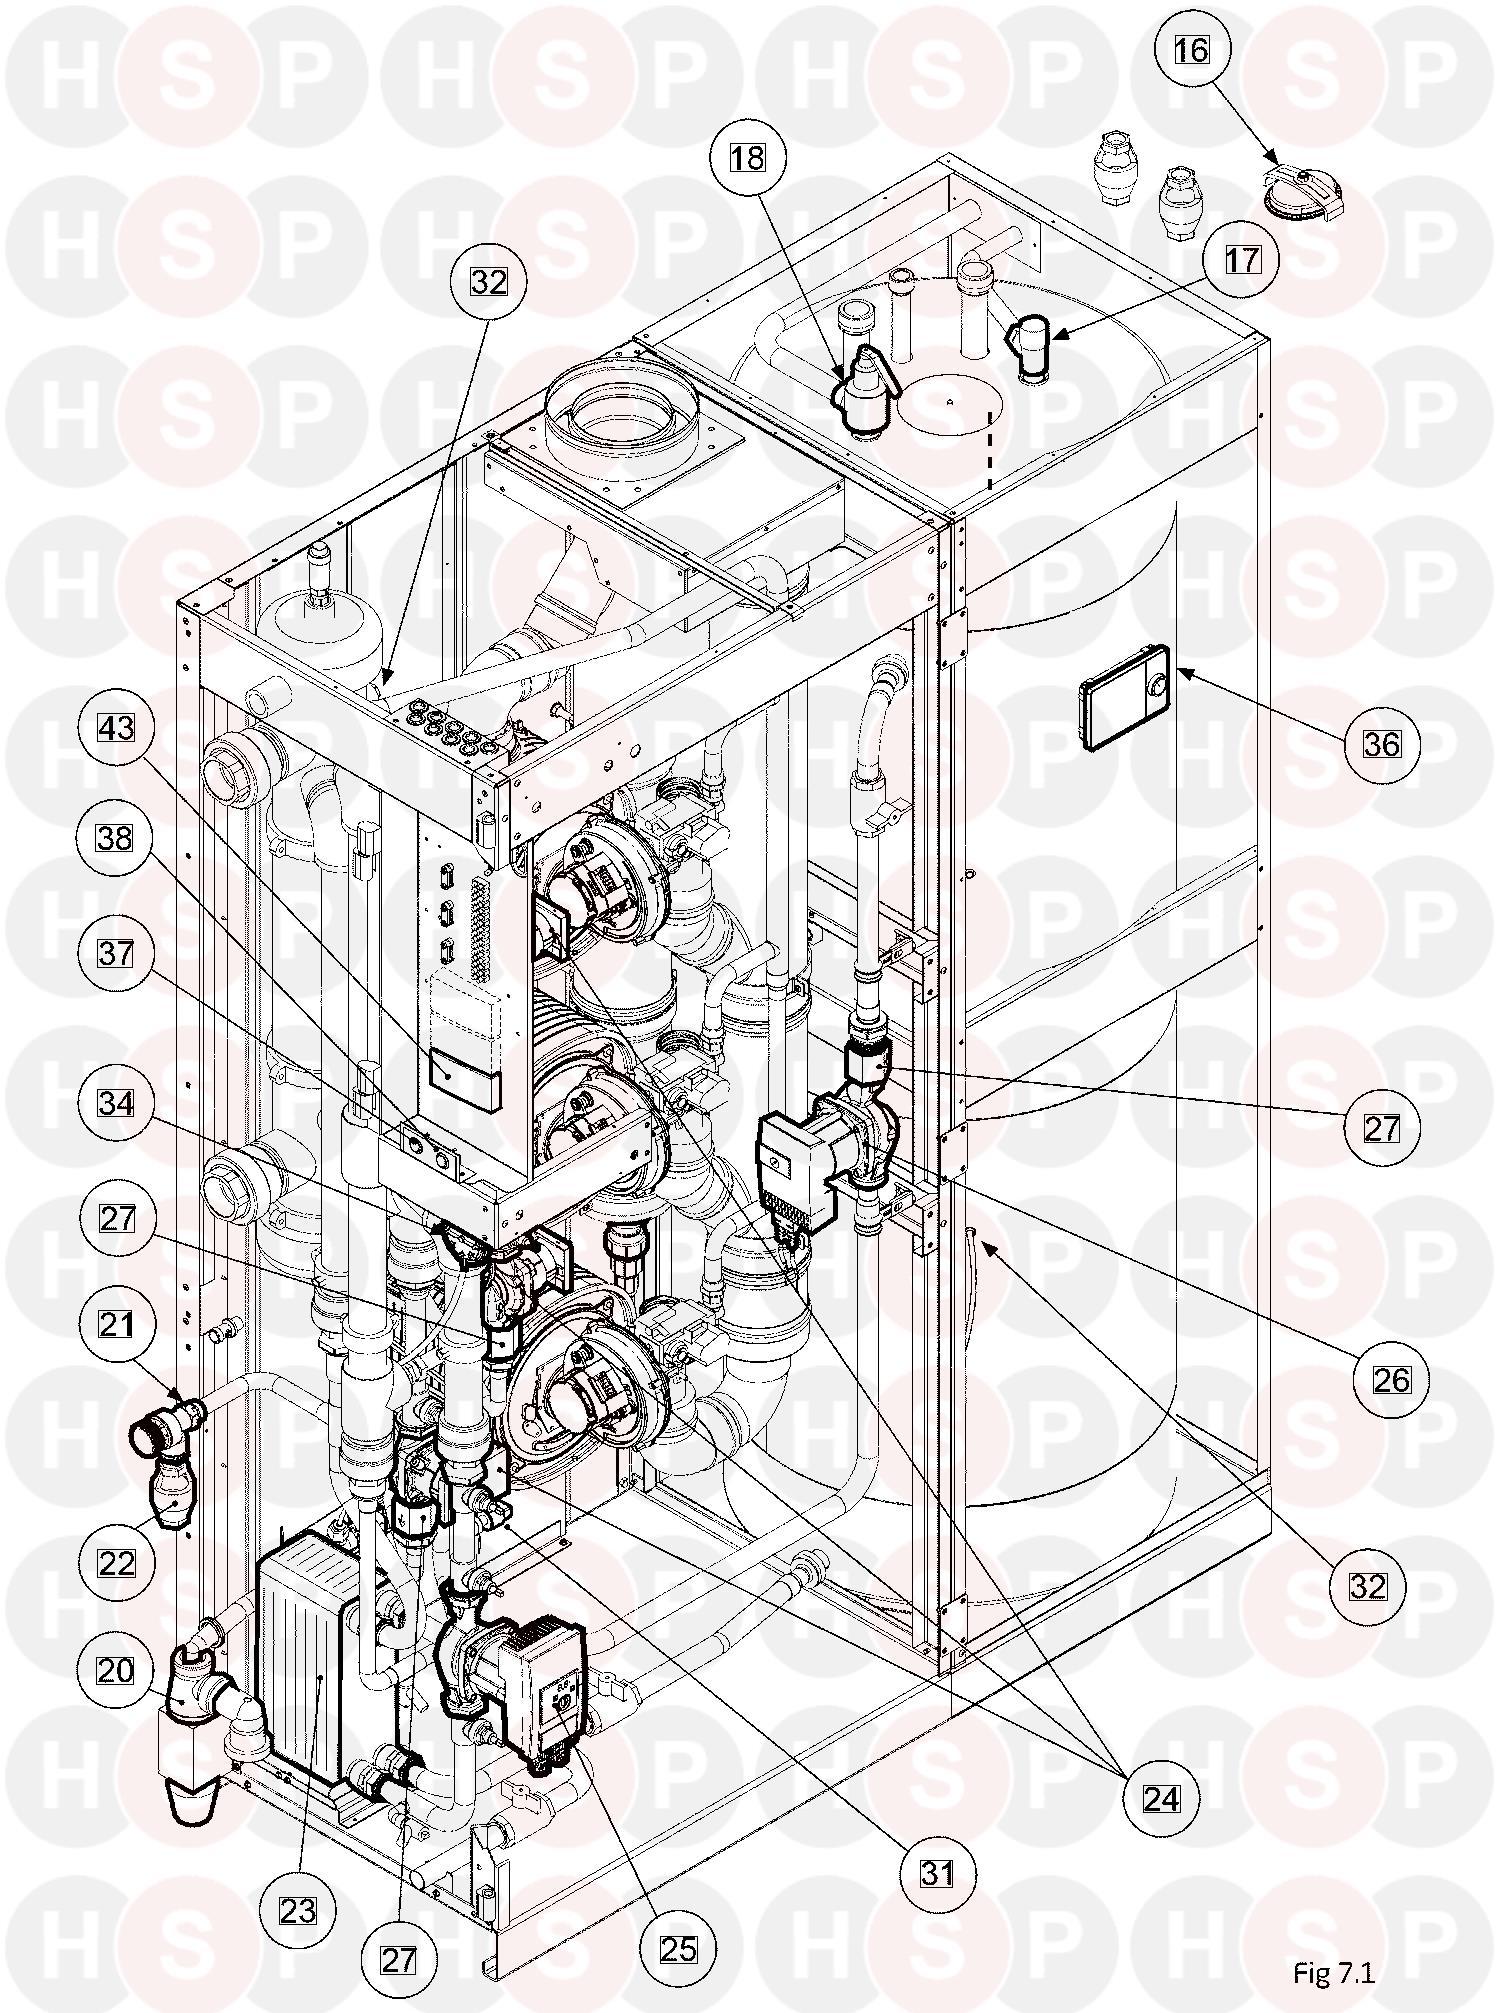 Andrews CombiFlo 100/300 (PUMP TANK PIPE WORK)Diagram